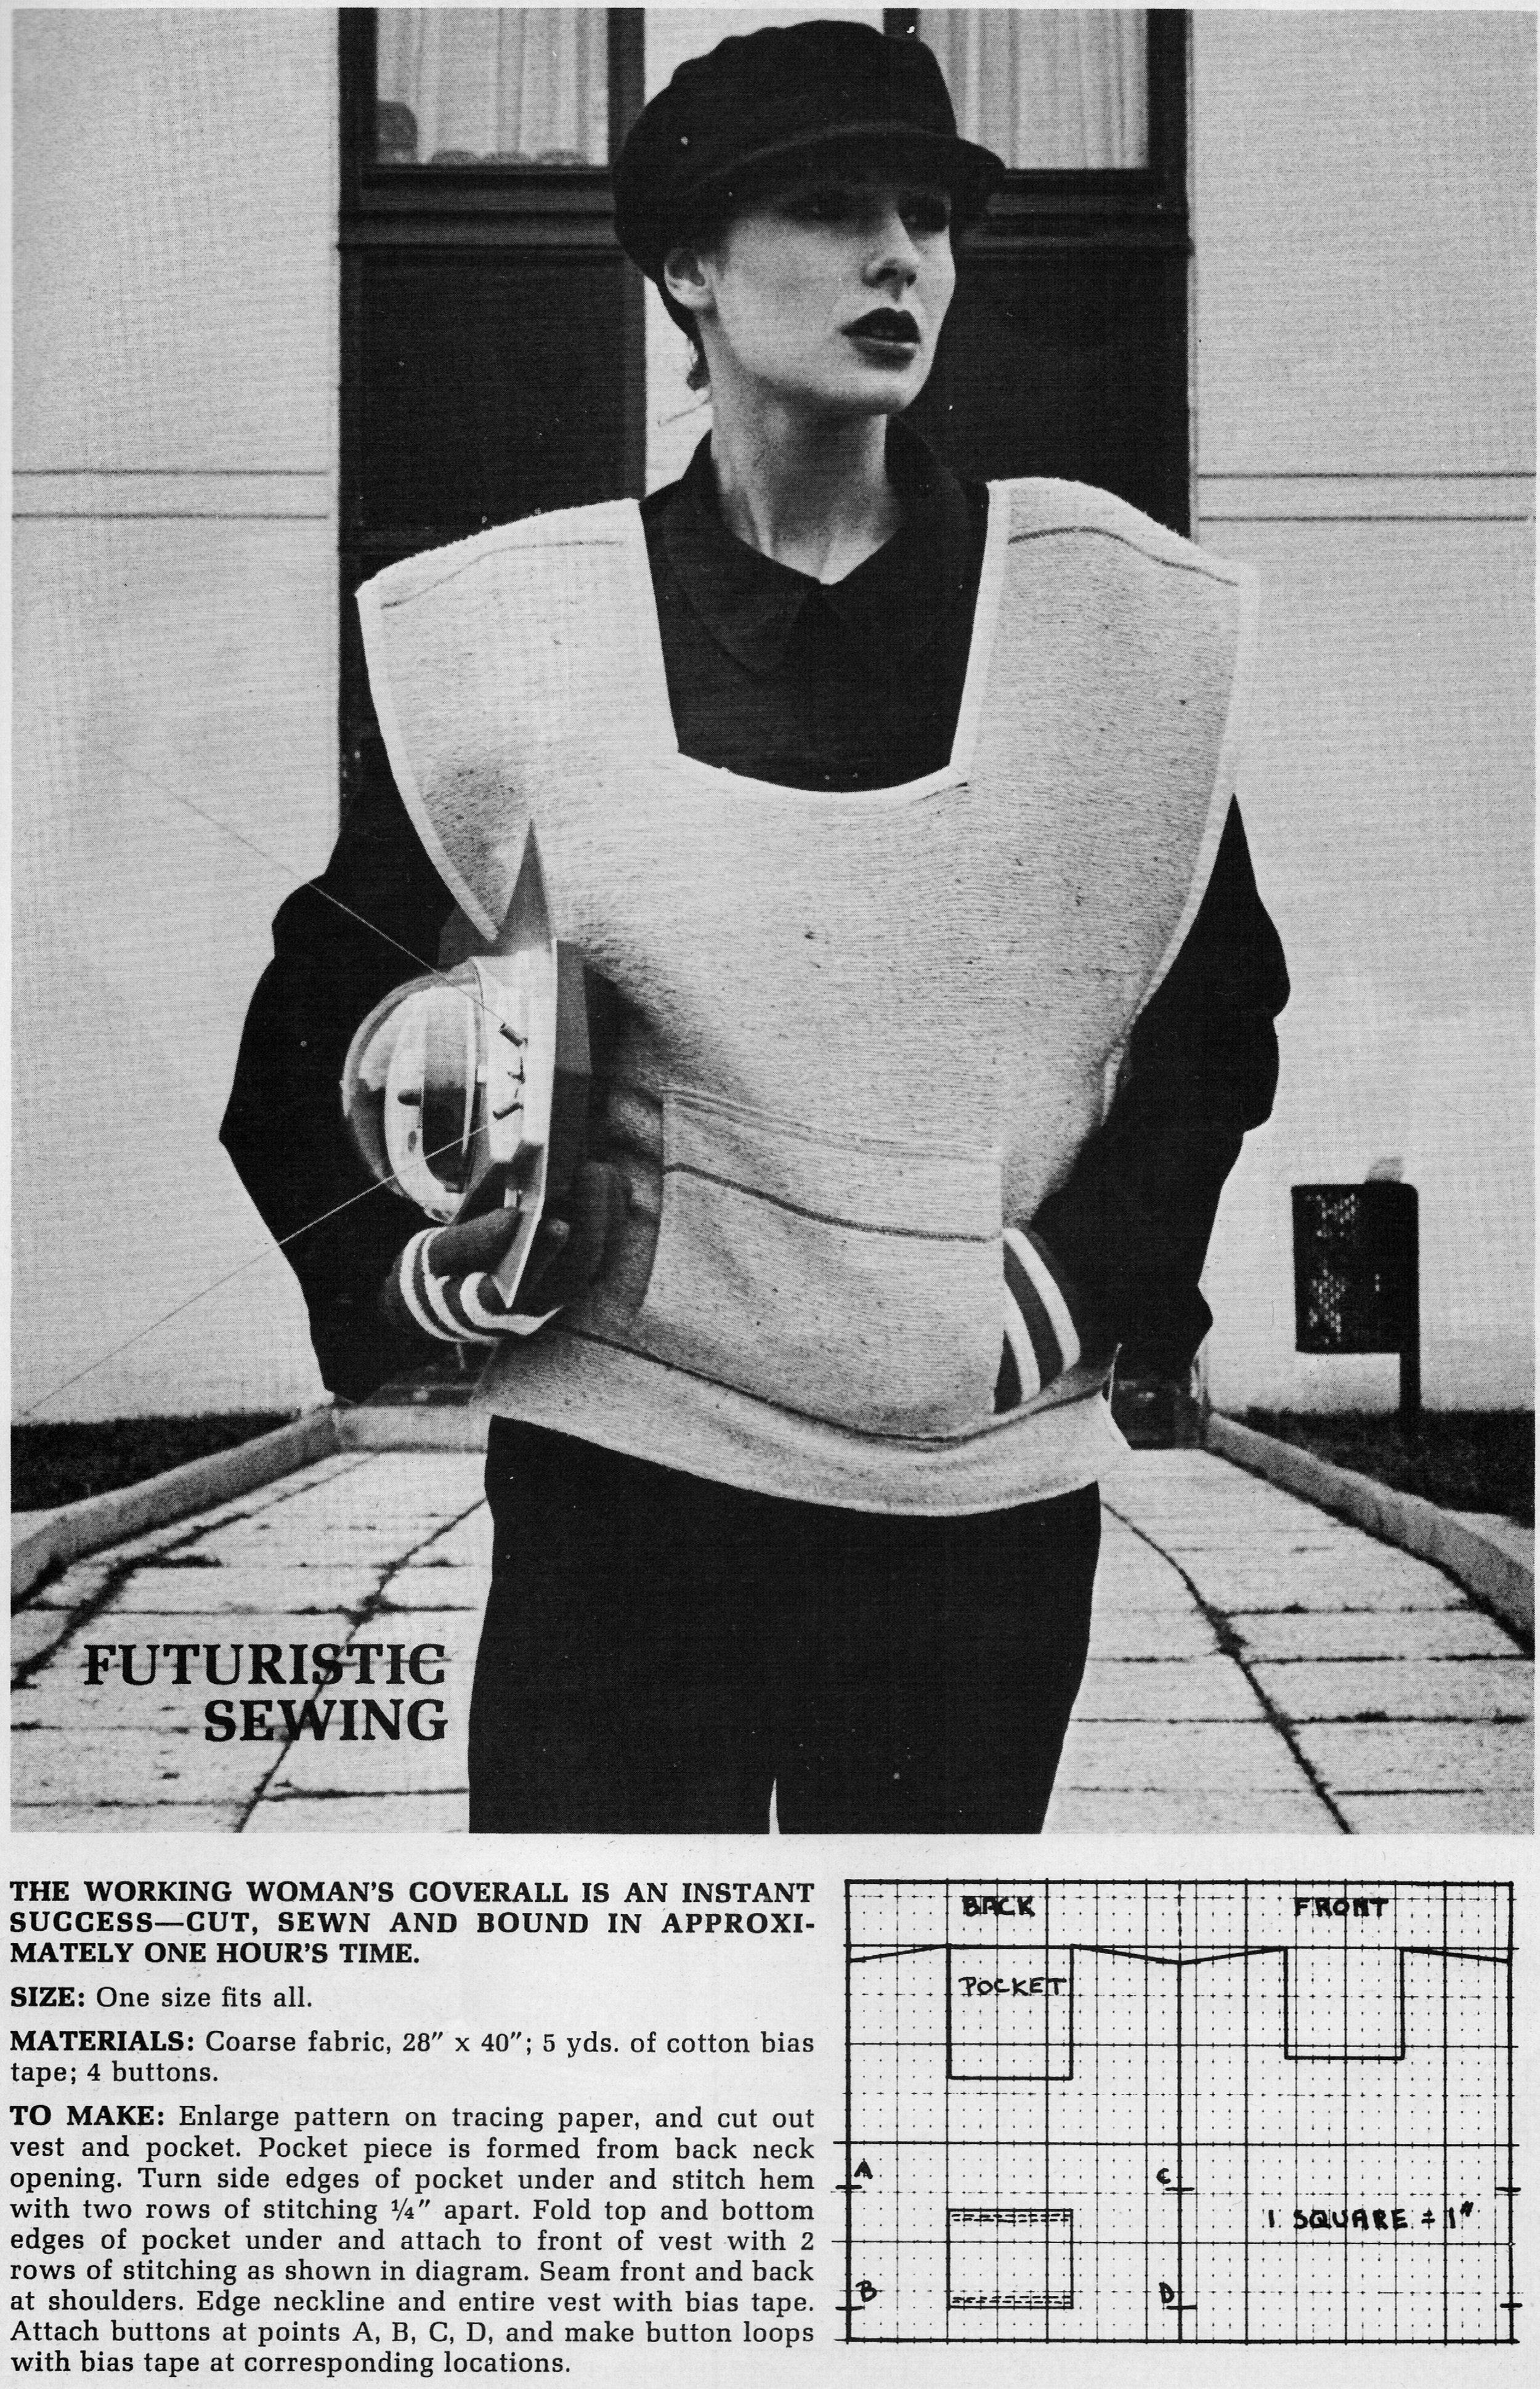 futuristi.jpg